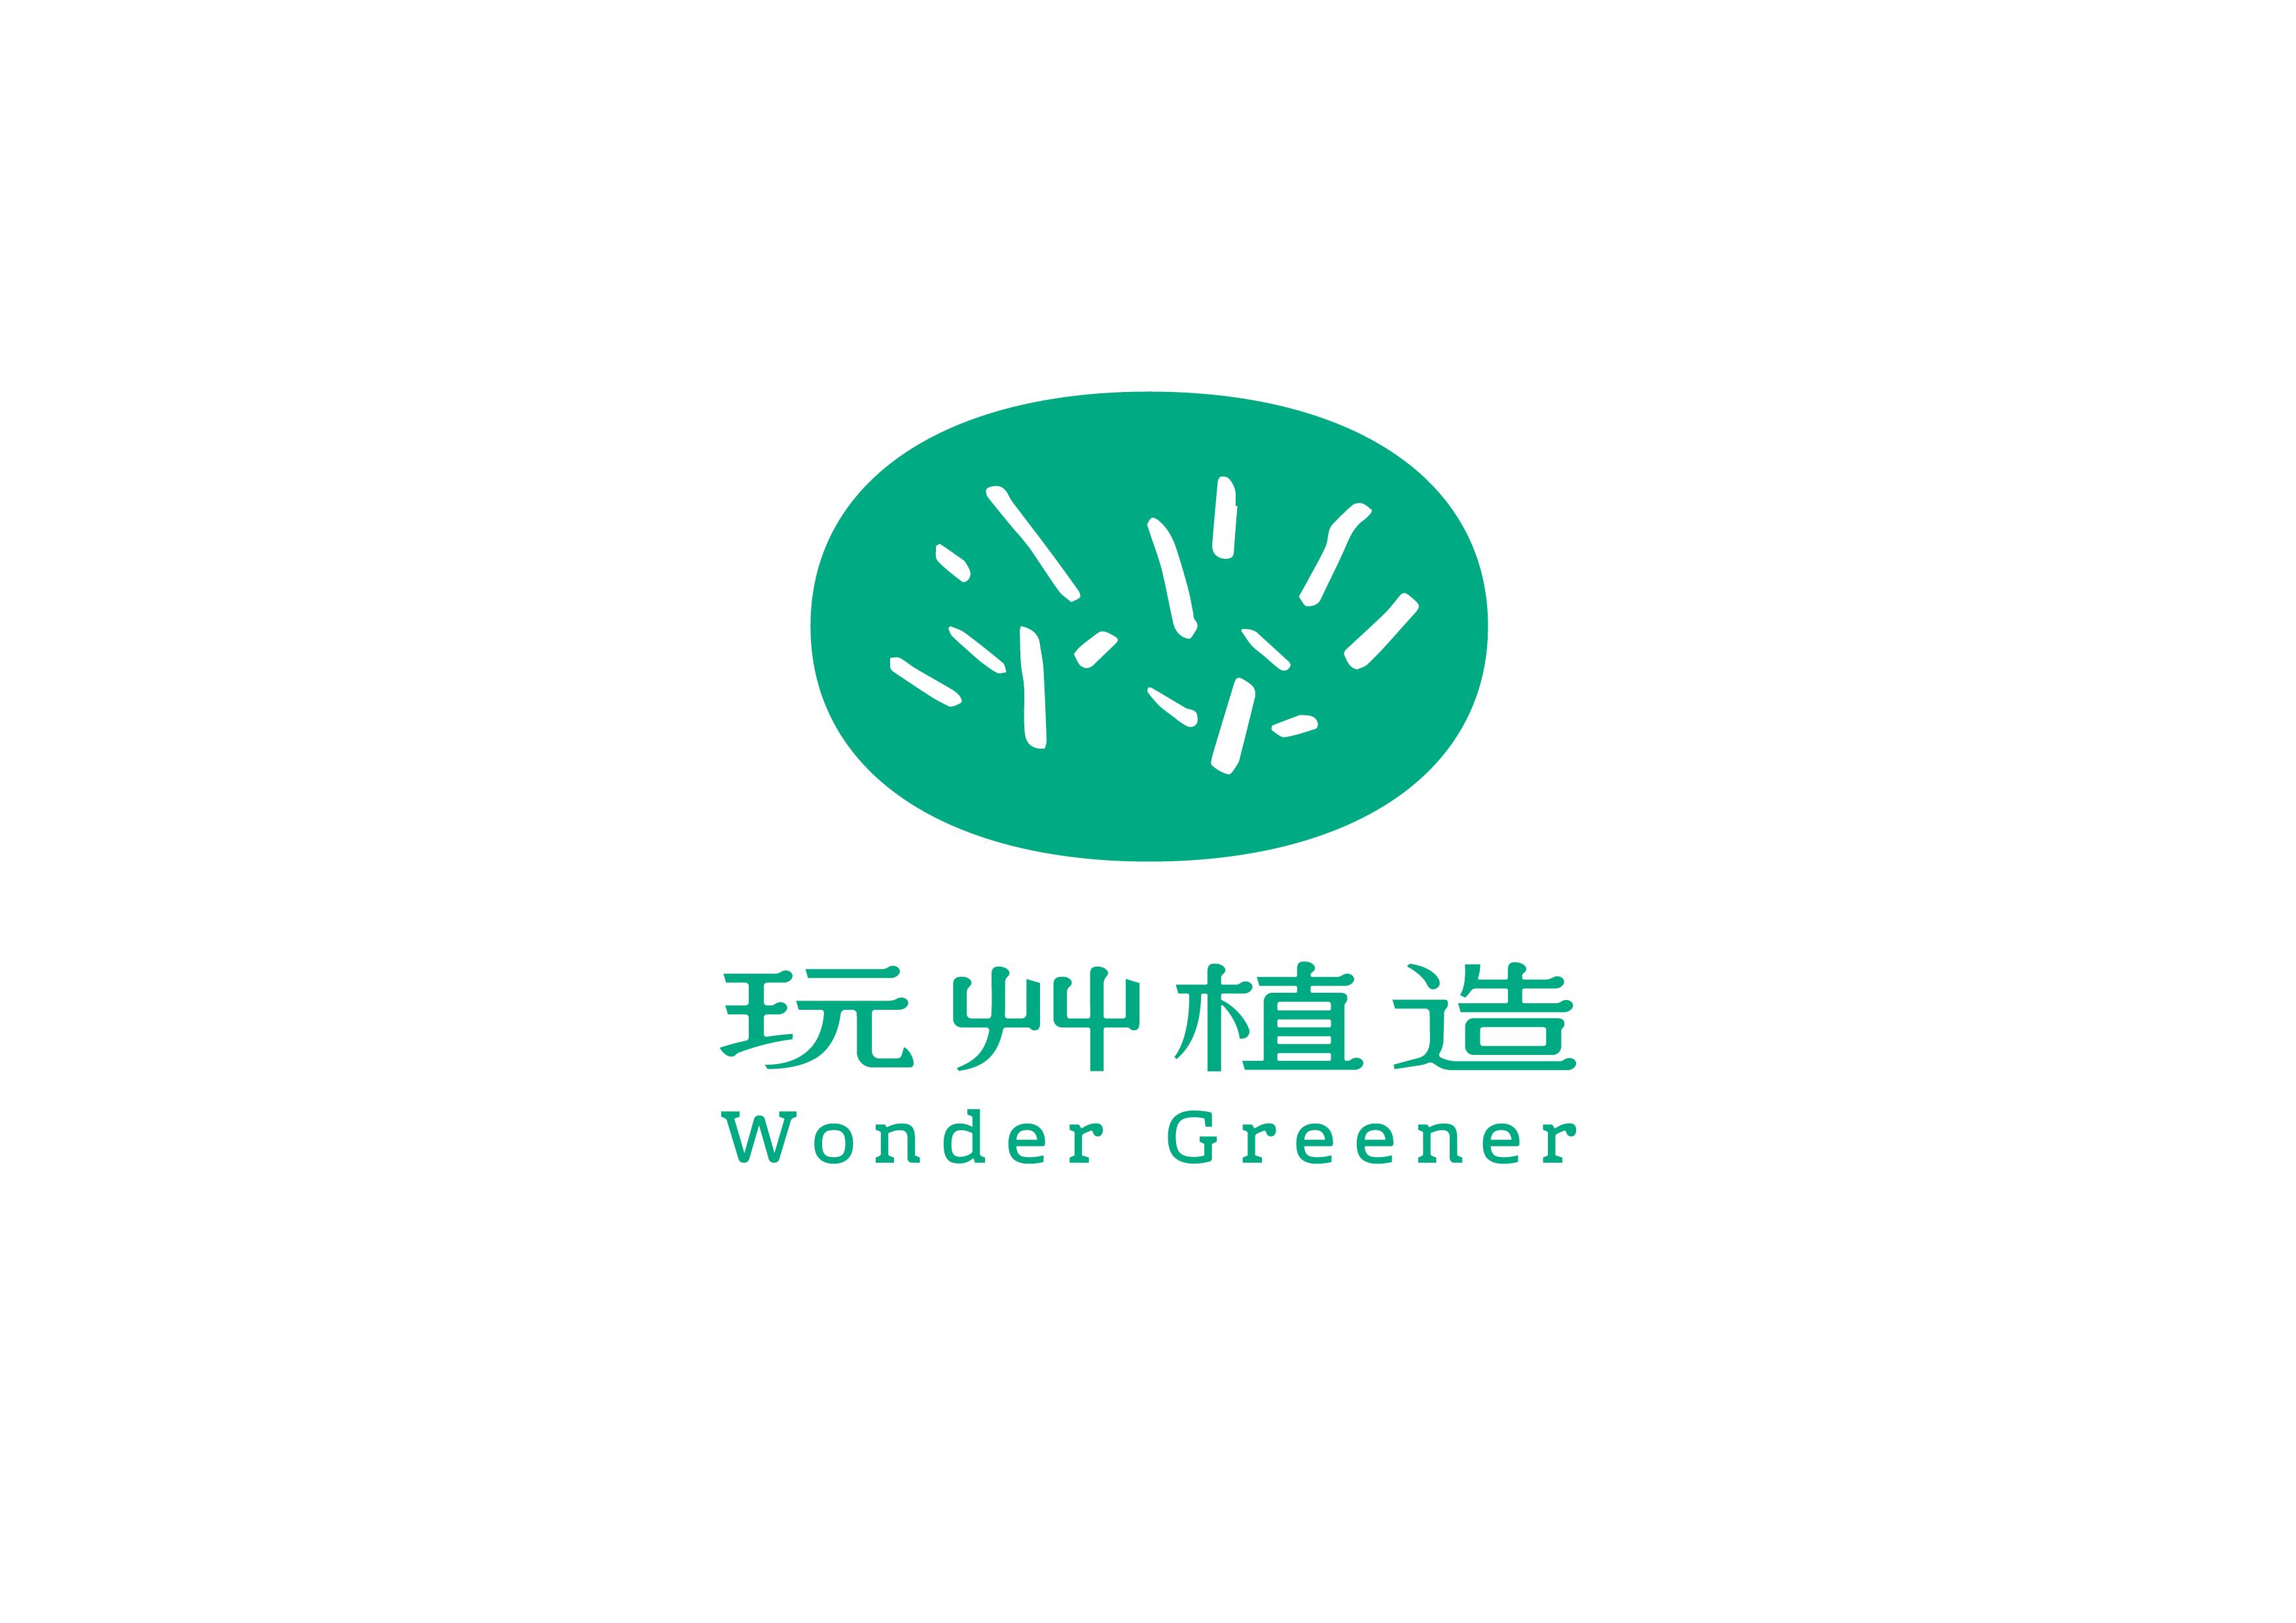 Wonder Greener